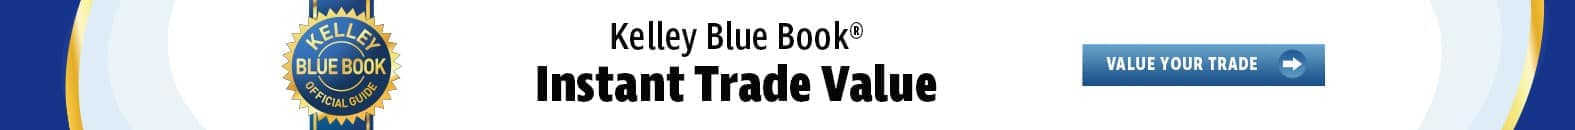 KBB Buy Back   Harlingen, TX